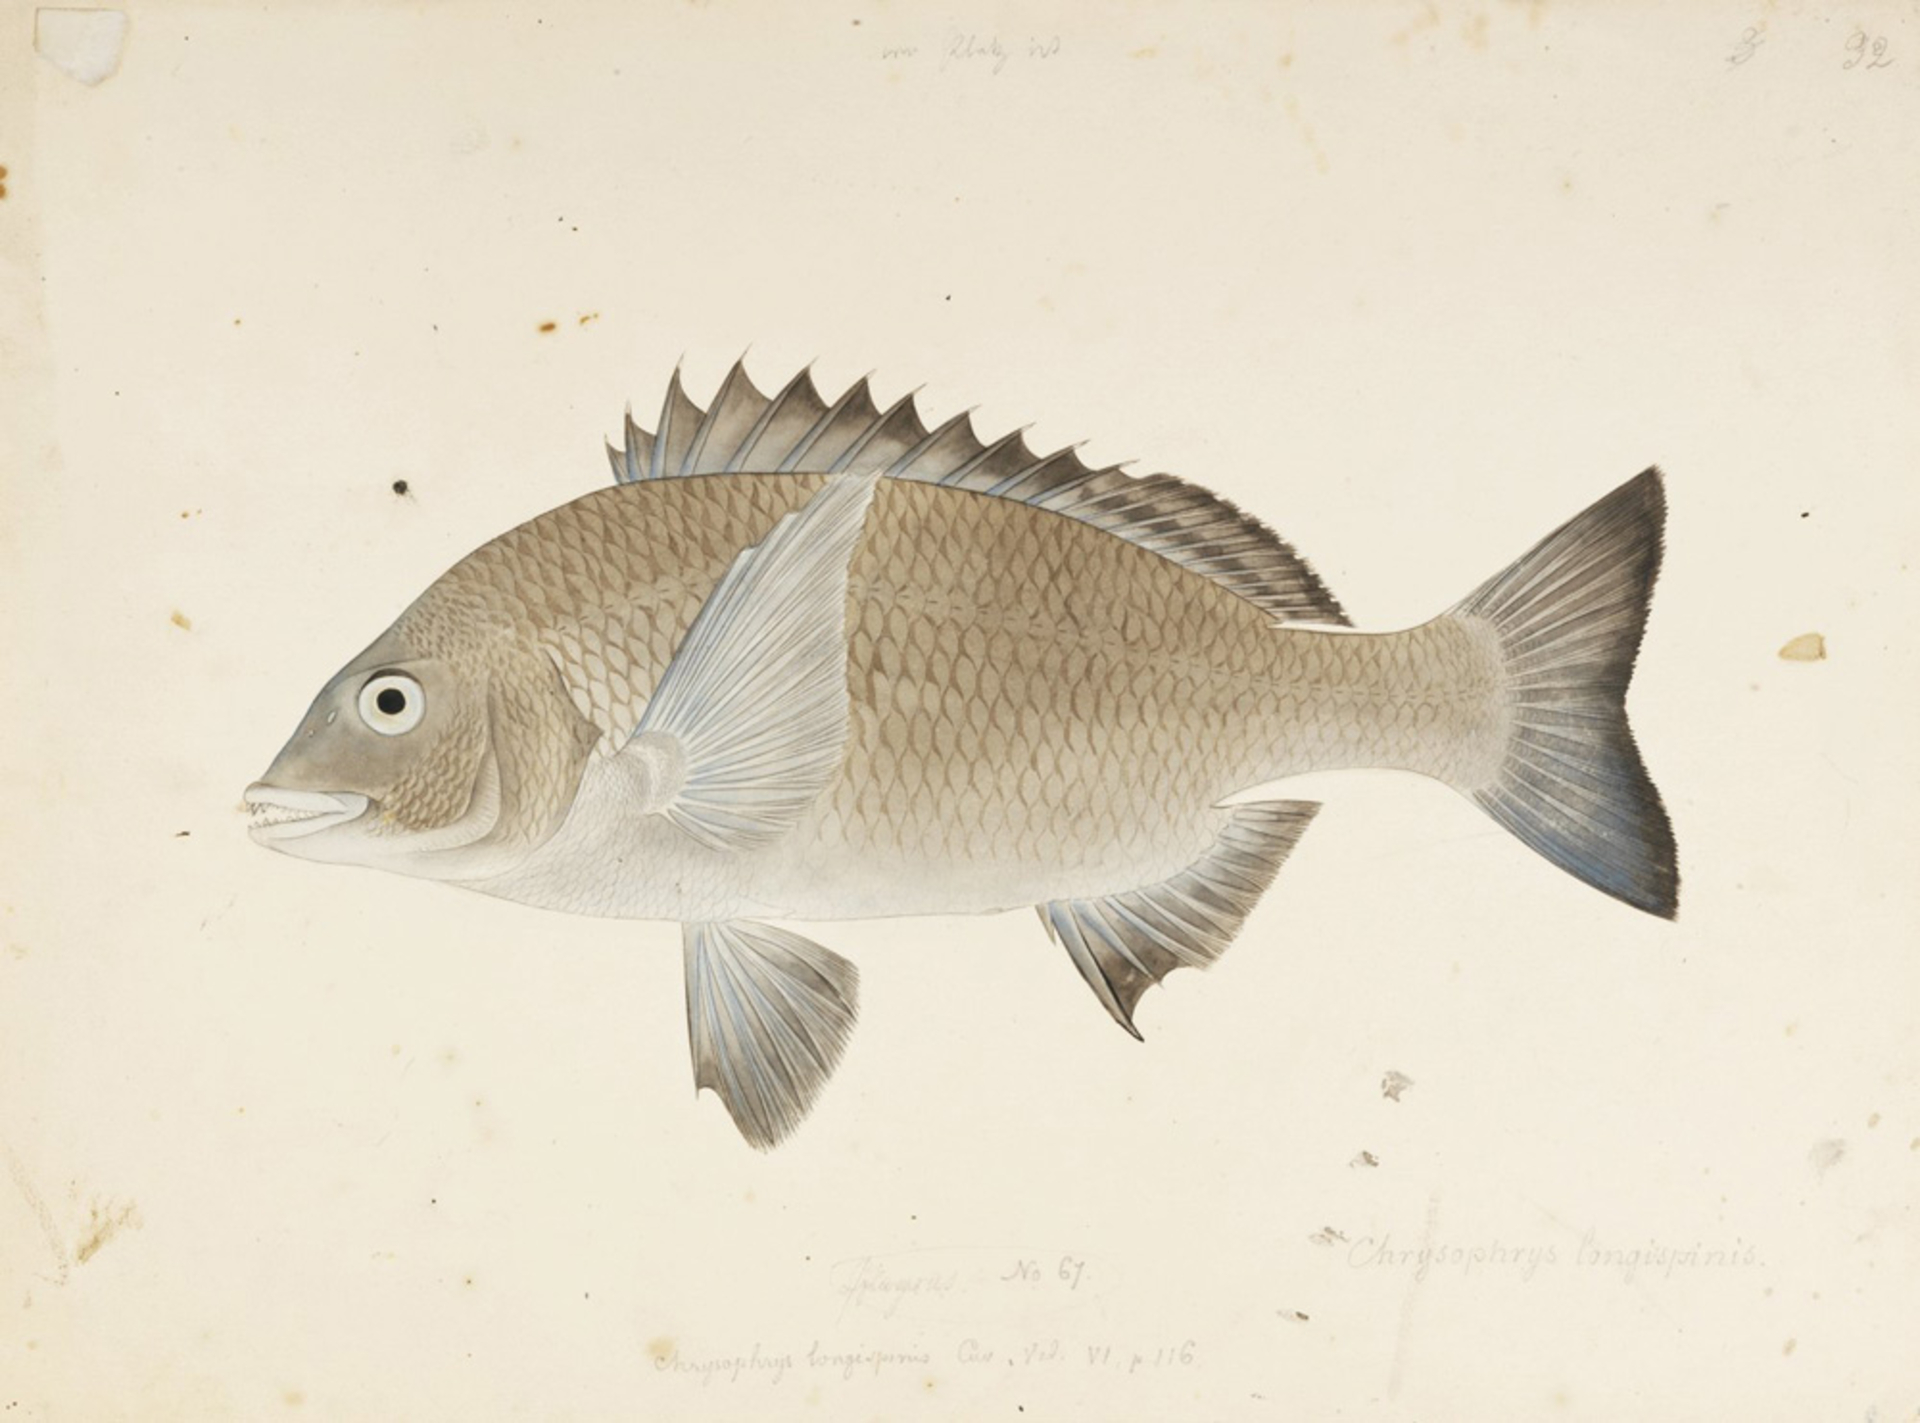 RMNH.ART.397 | Acanthopagrus schlegelii